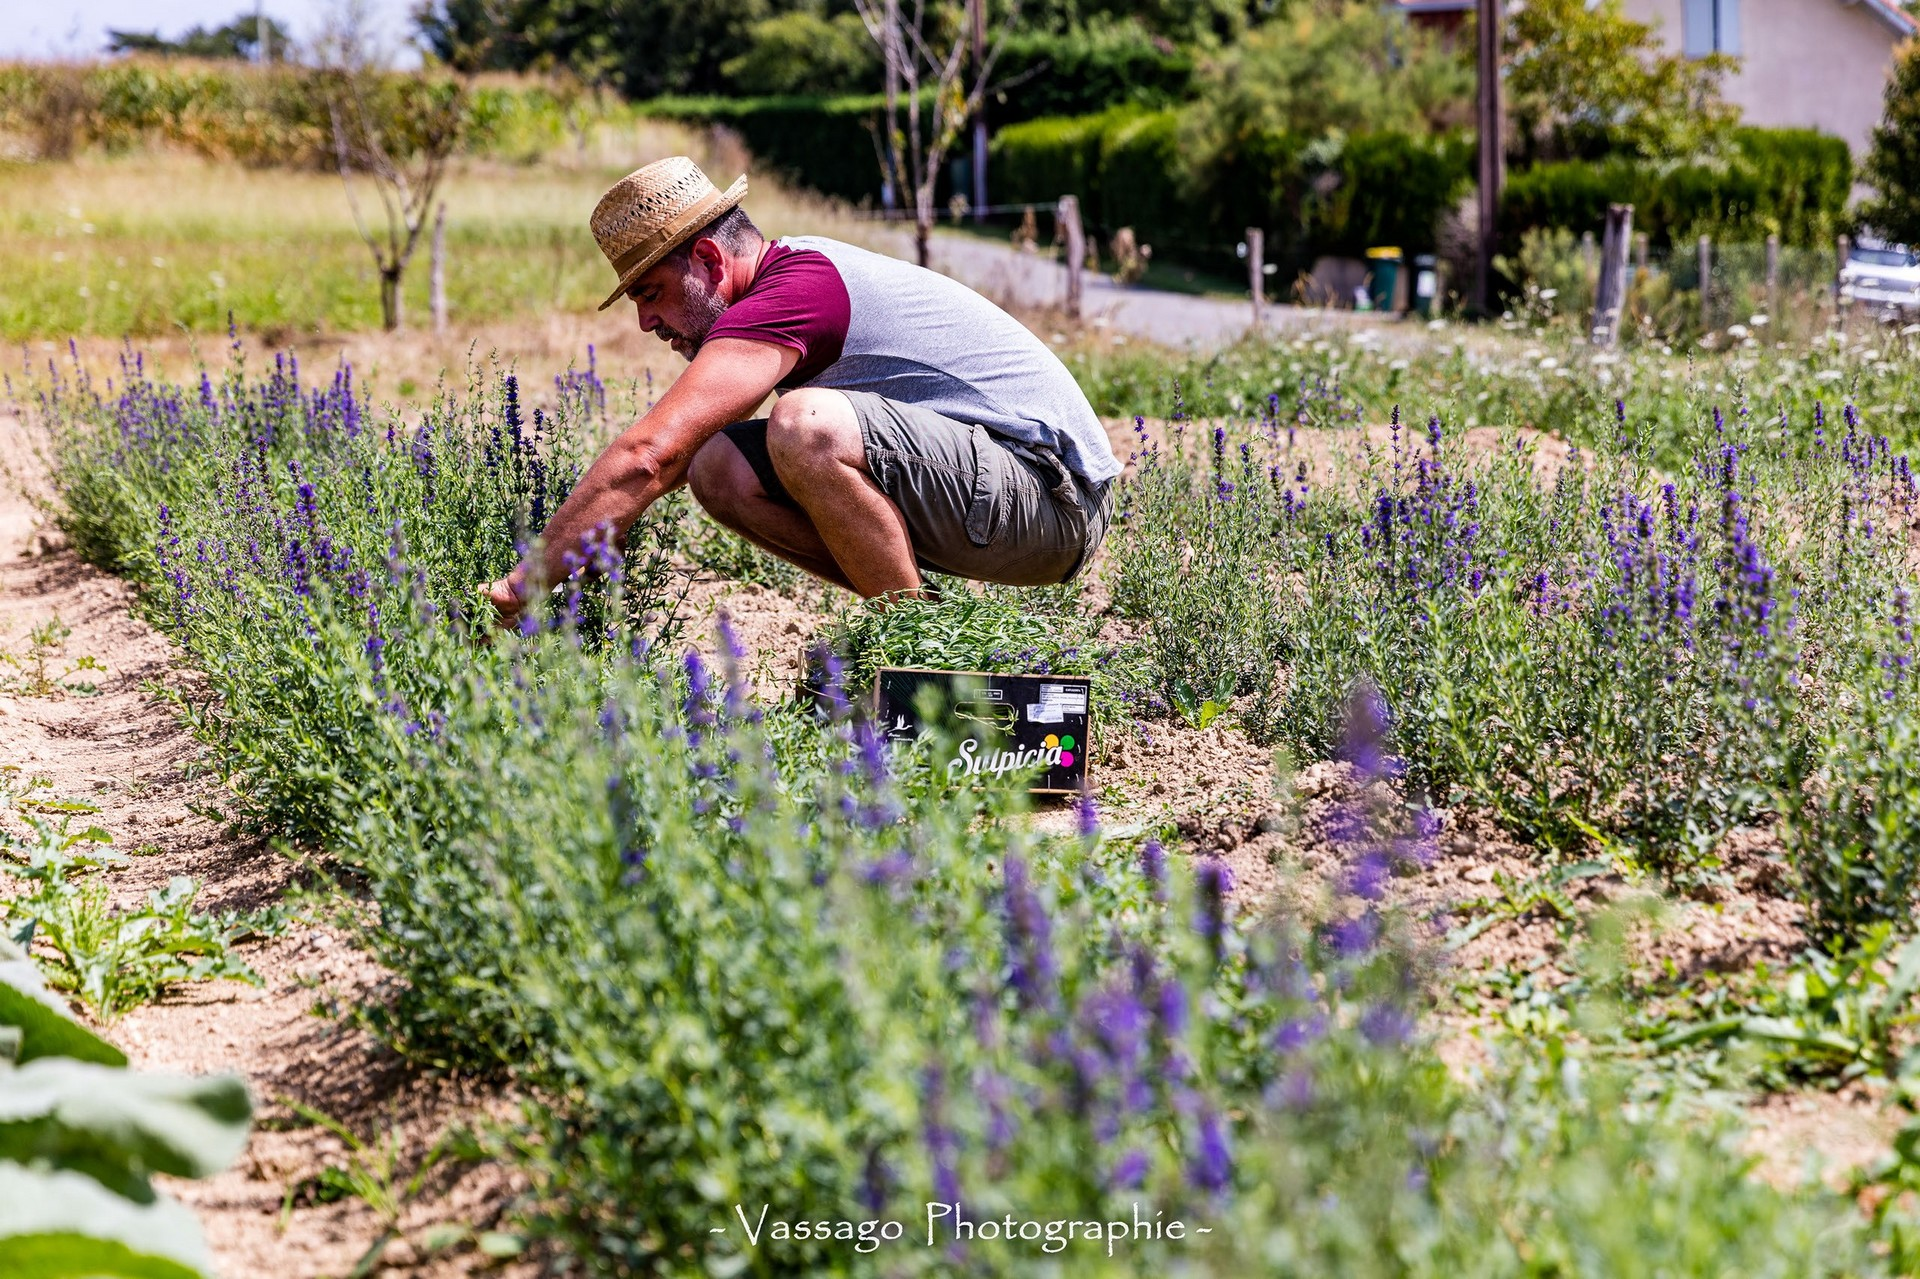 Découverte d'un métier d'antan : paysan herboriste - BAIGTS-DE-BEARN